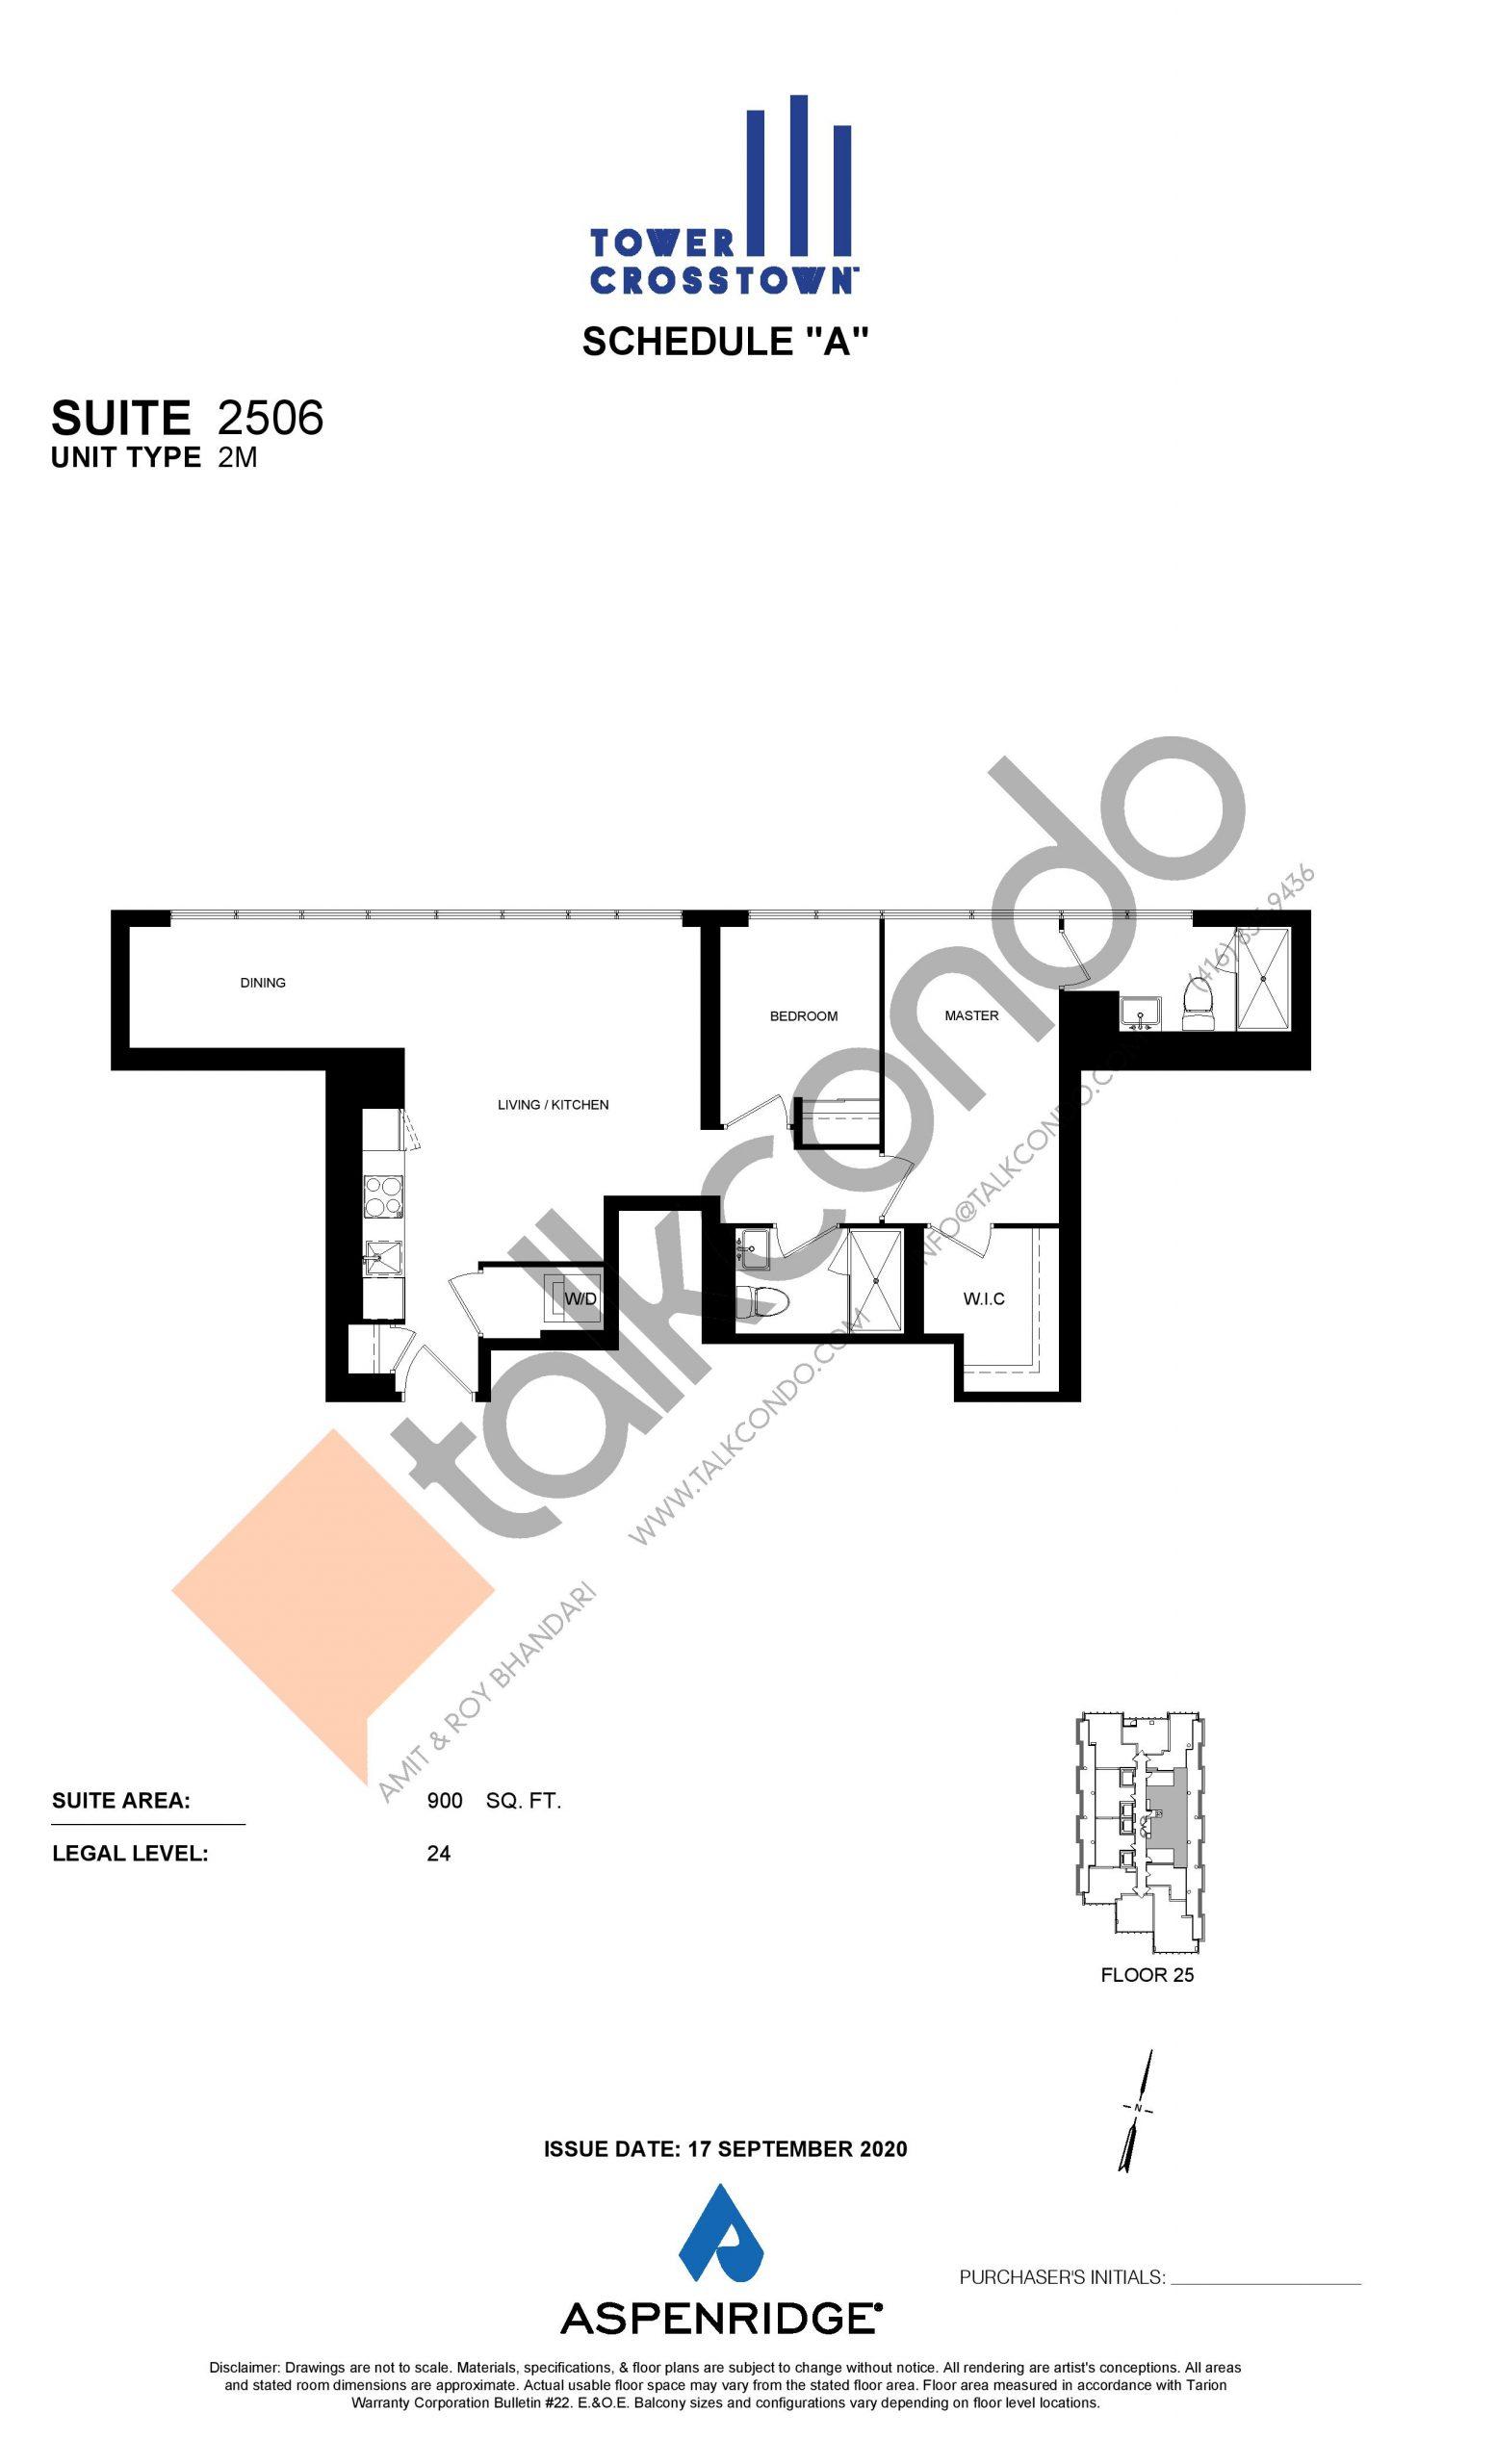 Suite 2506 - 2M Floor Plan at Crosstown Tower 3 Condos - 900 sq.ft